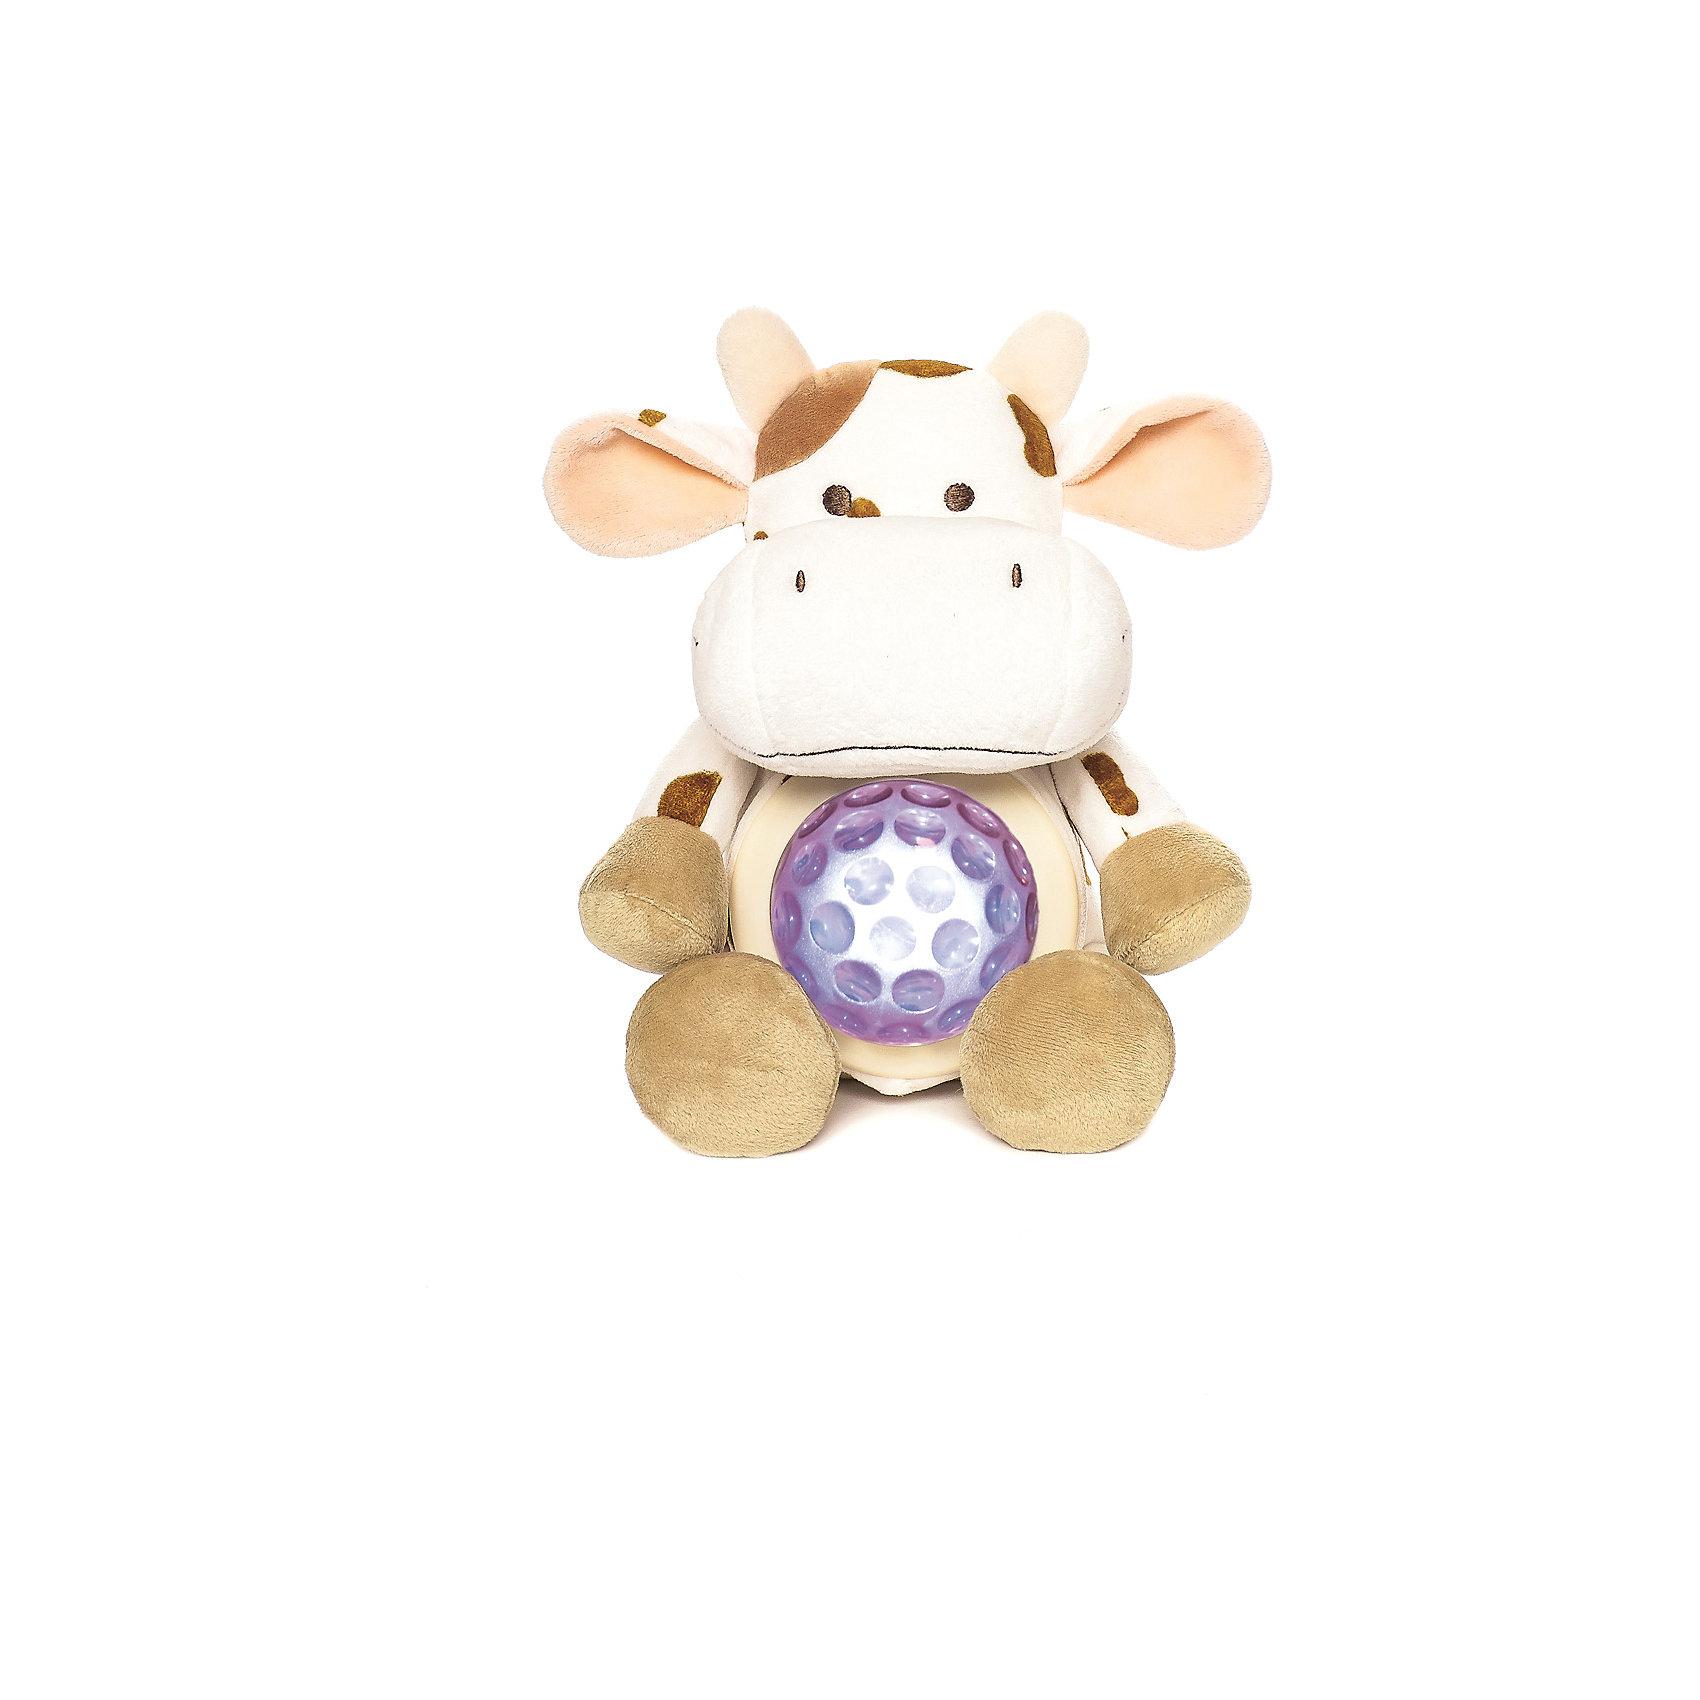 Teddykompaniet Ночник Корова, Динглисар, Teddykompaniet ночник bradex звездное небо